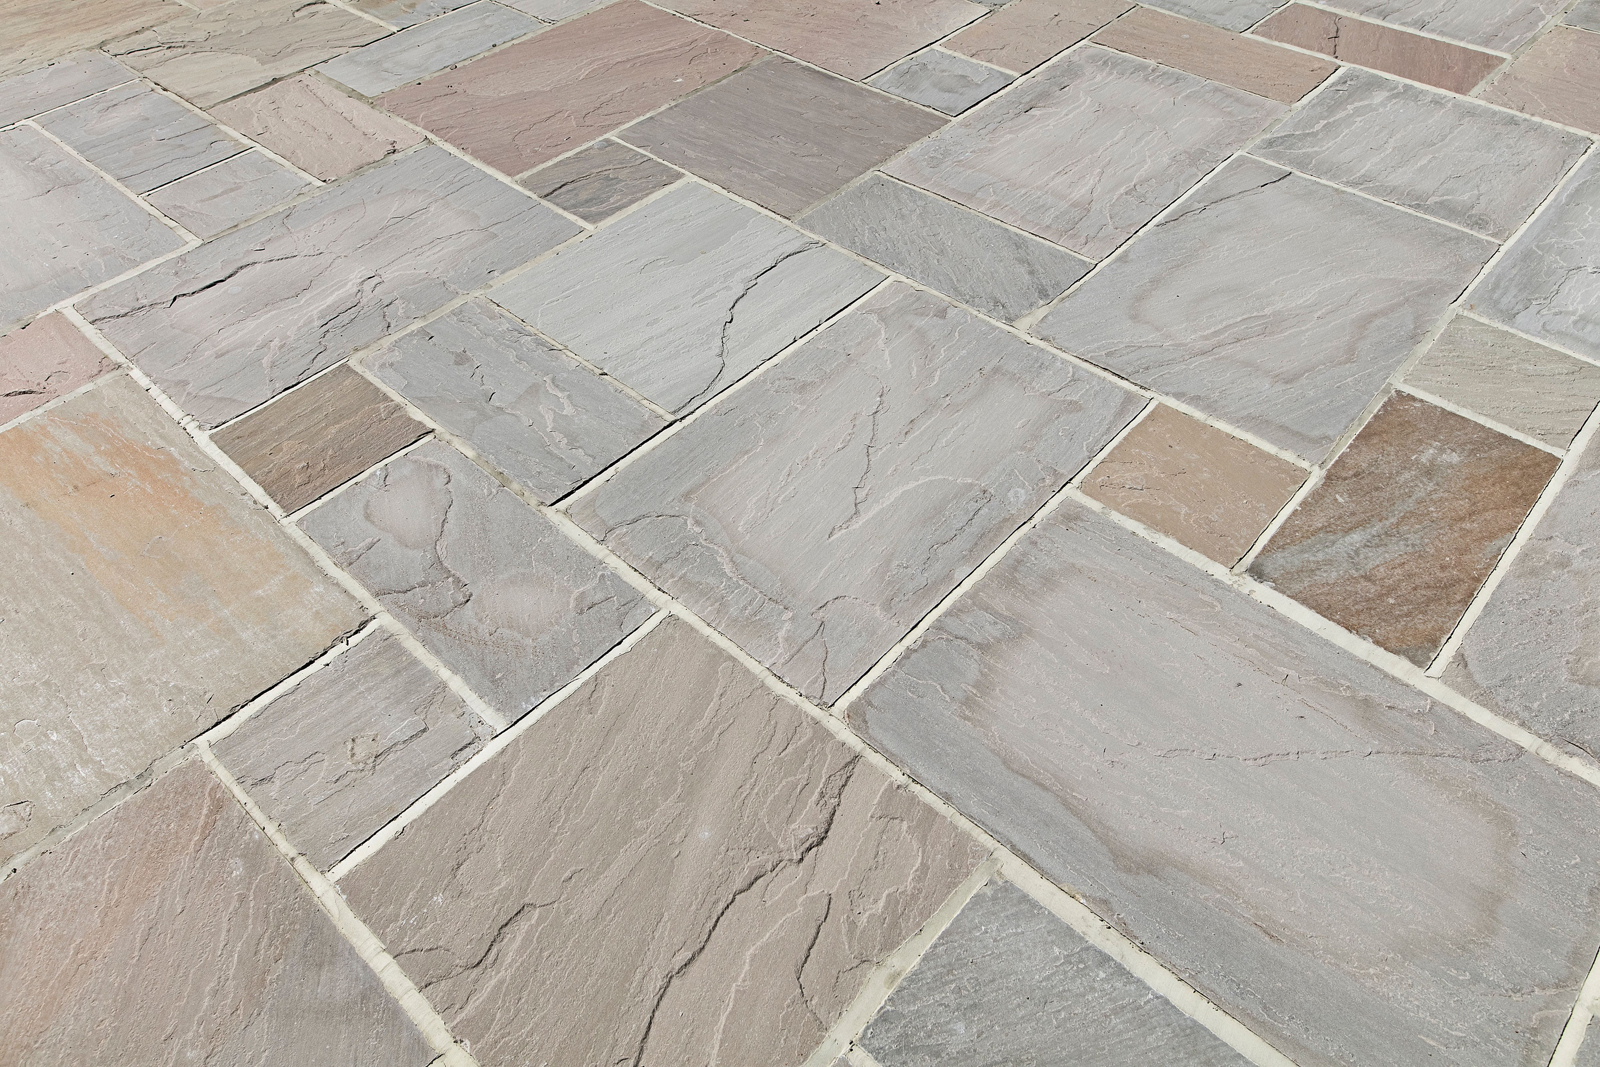 Laying Patterns Stone Paving Patterns